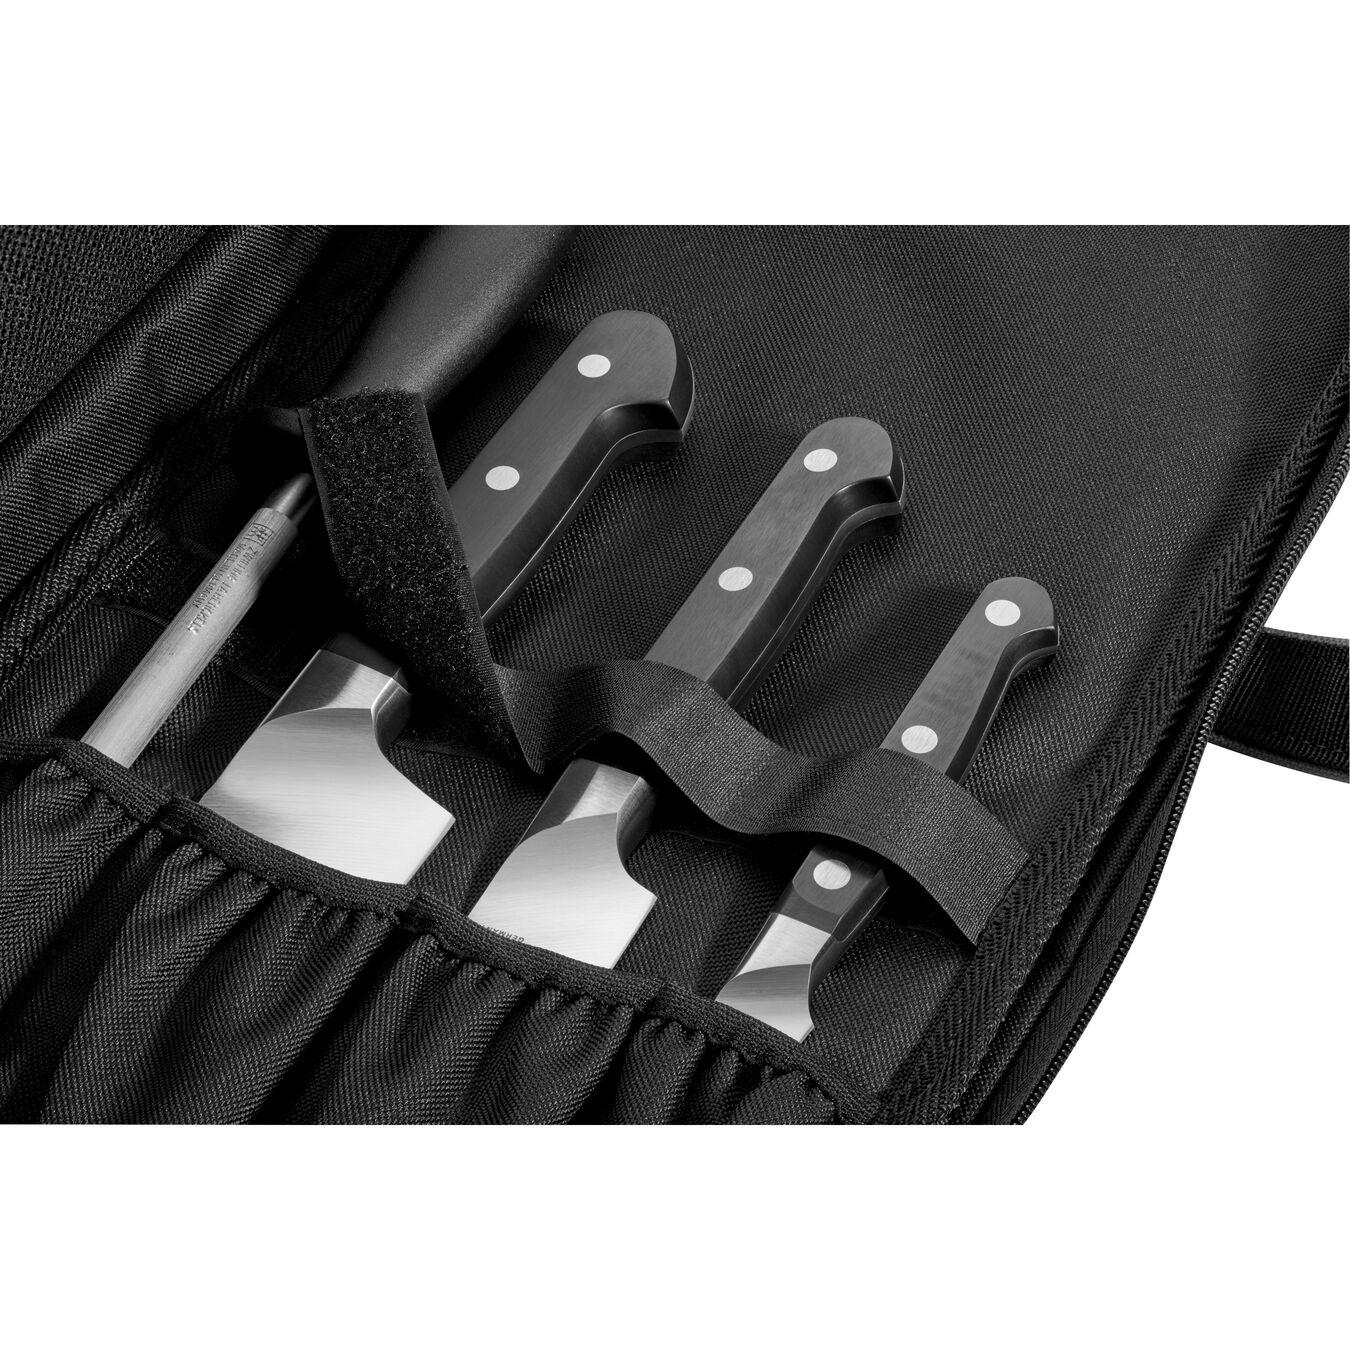 Knife case, 20,,large 8